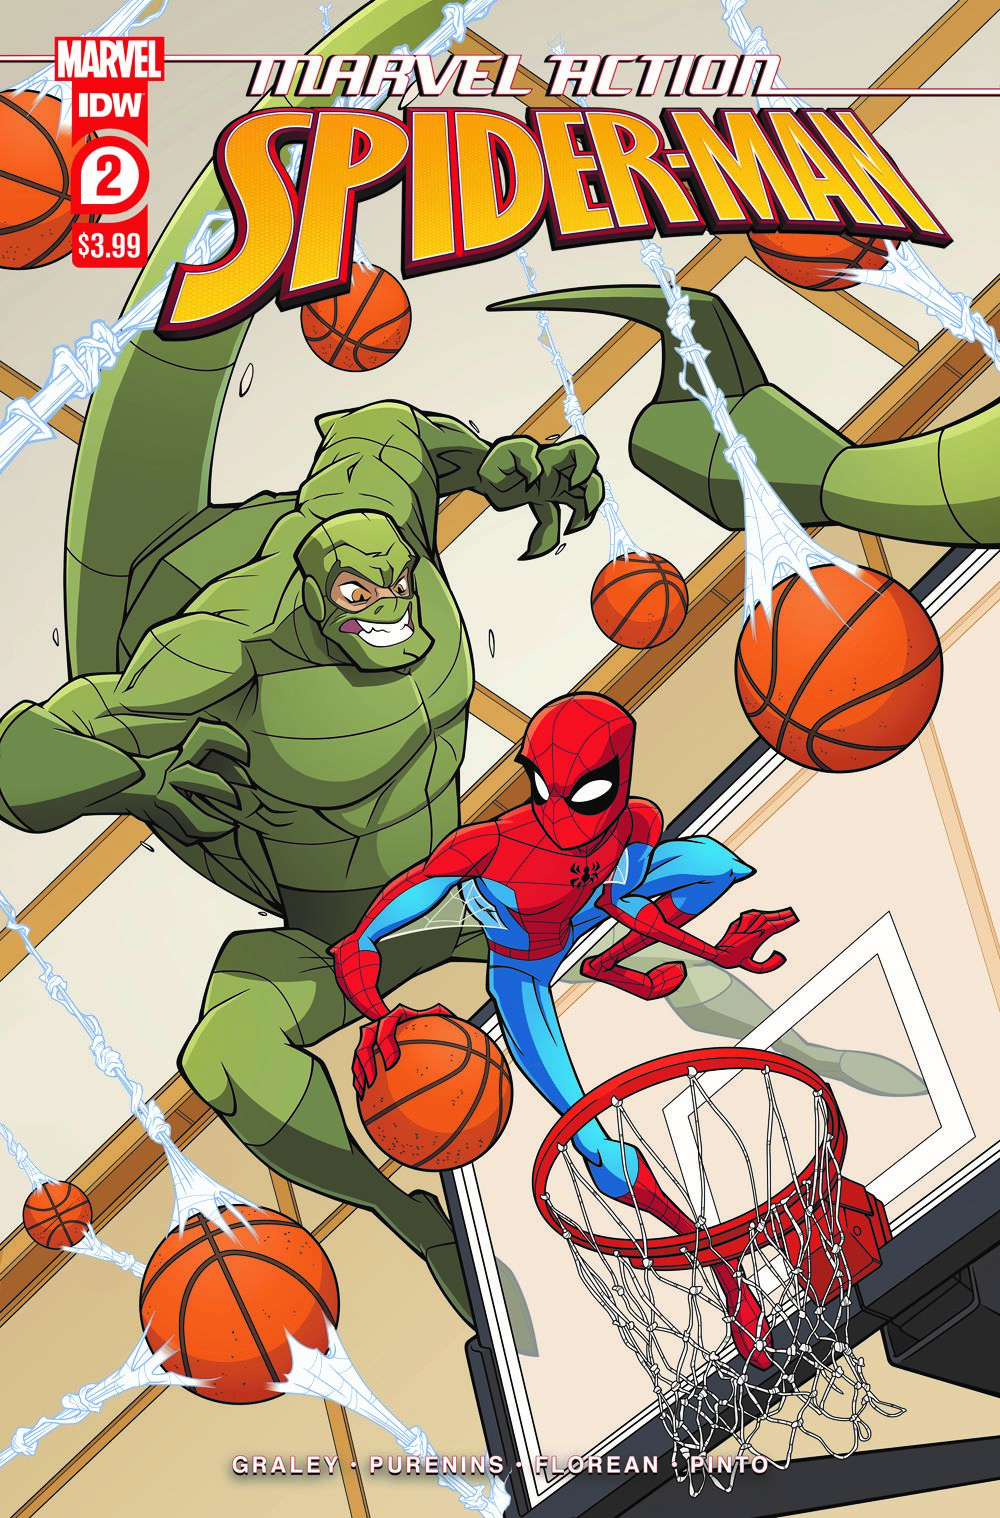 SpidermanV3-02_cvrA ComicList Previews: MARVEL ACTION SPIDER-MAN VOLUME 3 #2